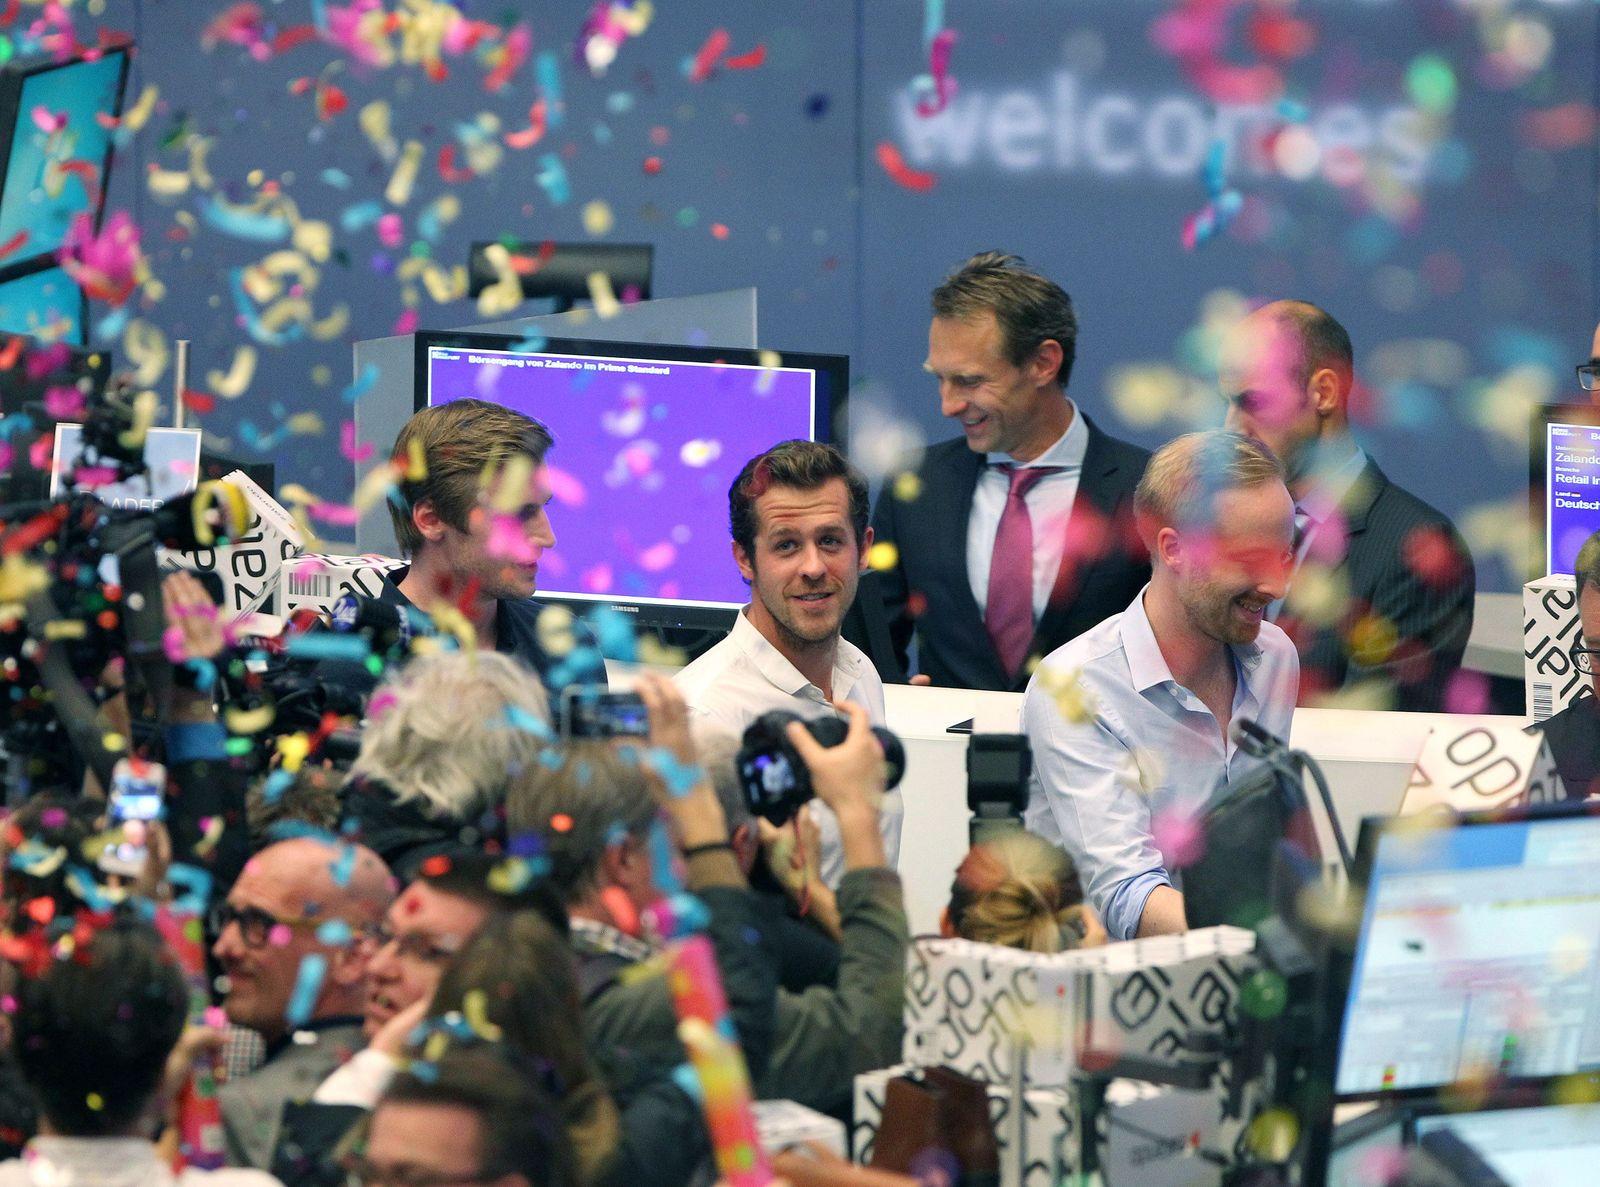 GERMANANY-FINANCE-ZALANDO-IPO-STOCK EXCHANGE